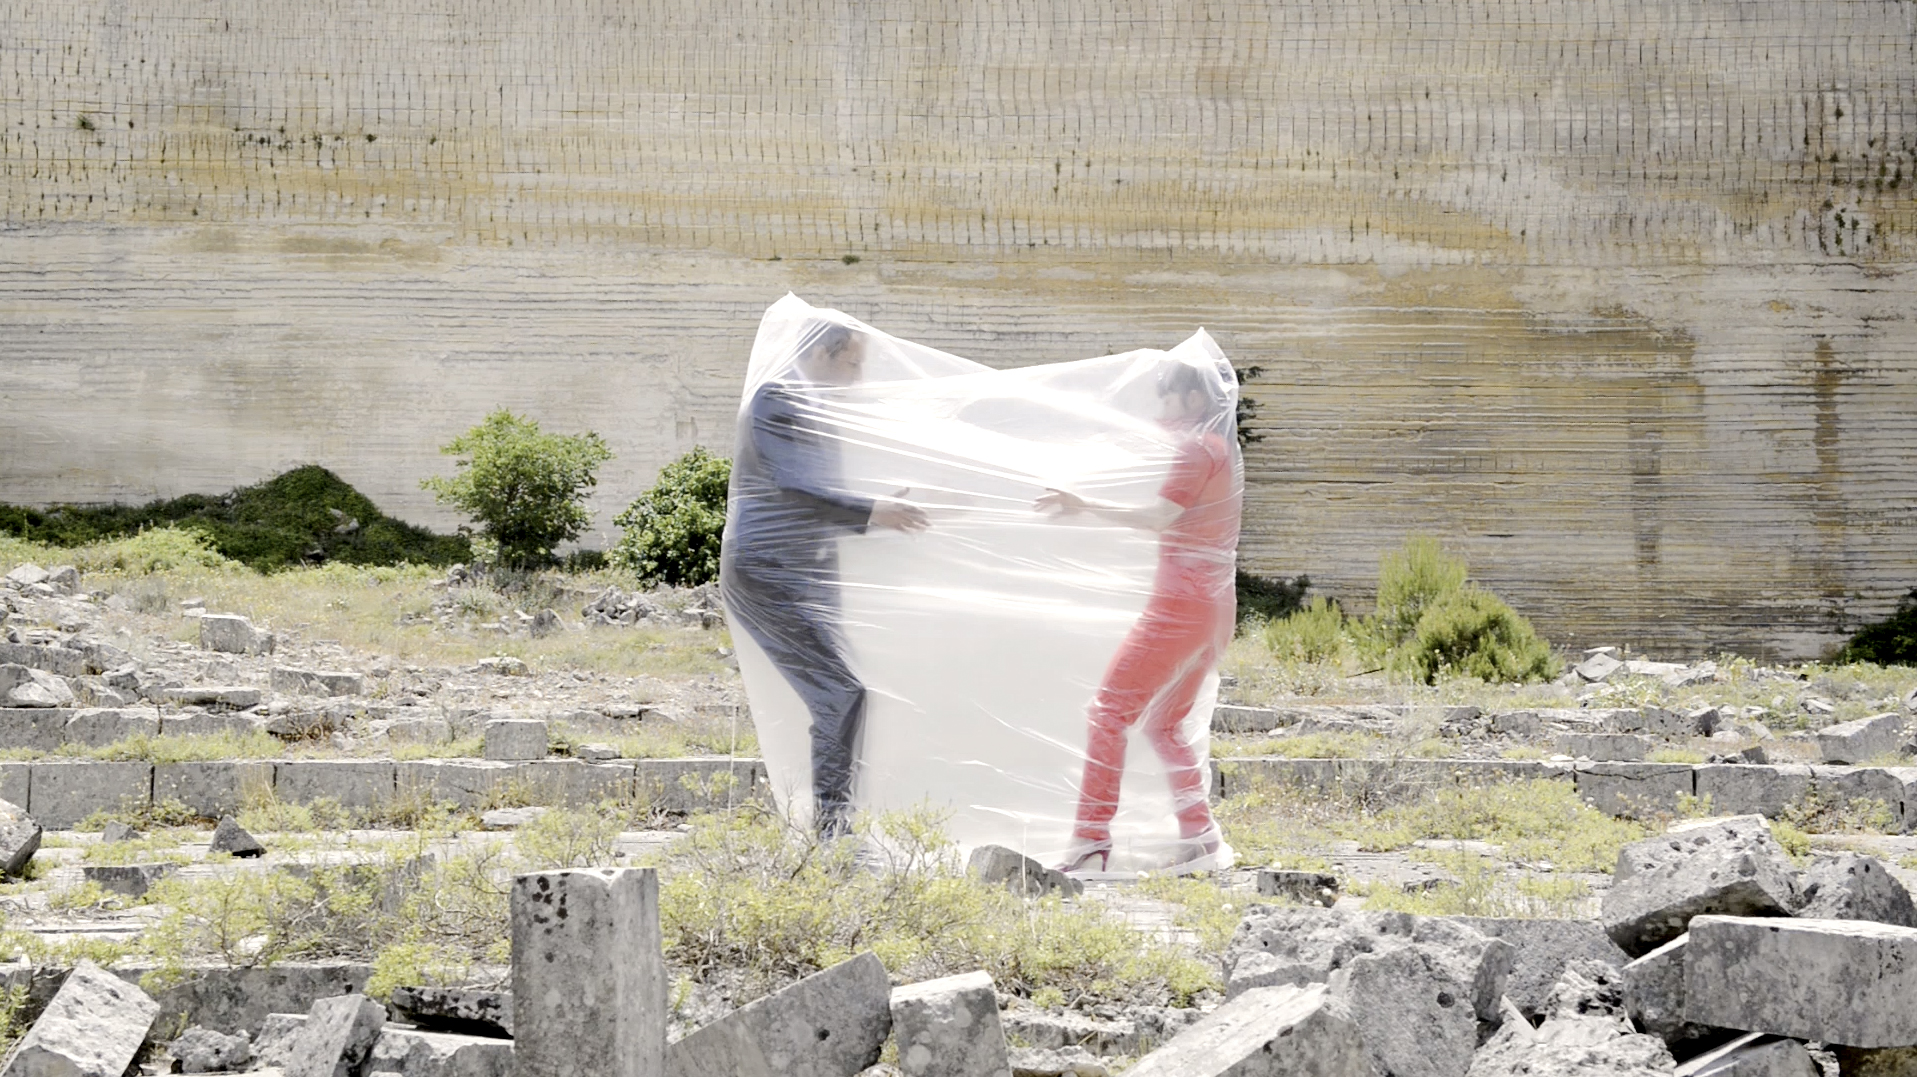 Credit: Luca Truffarelli  Performers:Michael Cooney Lucia Kickham -Freedom-to go!